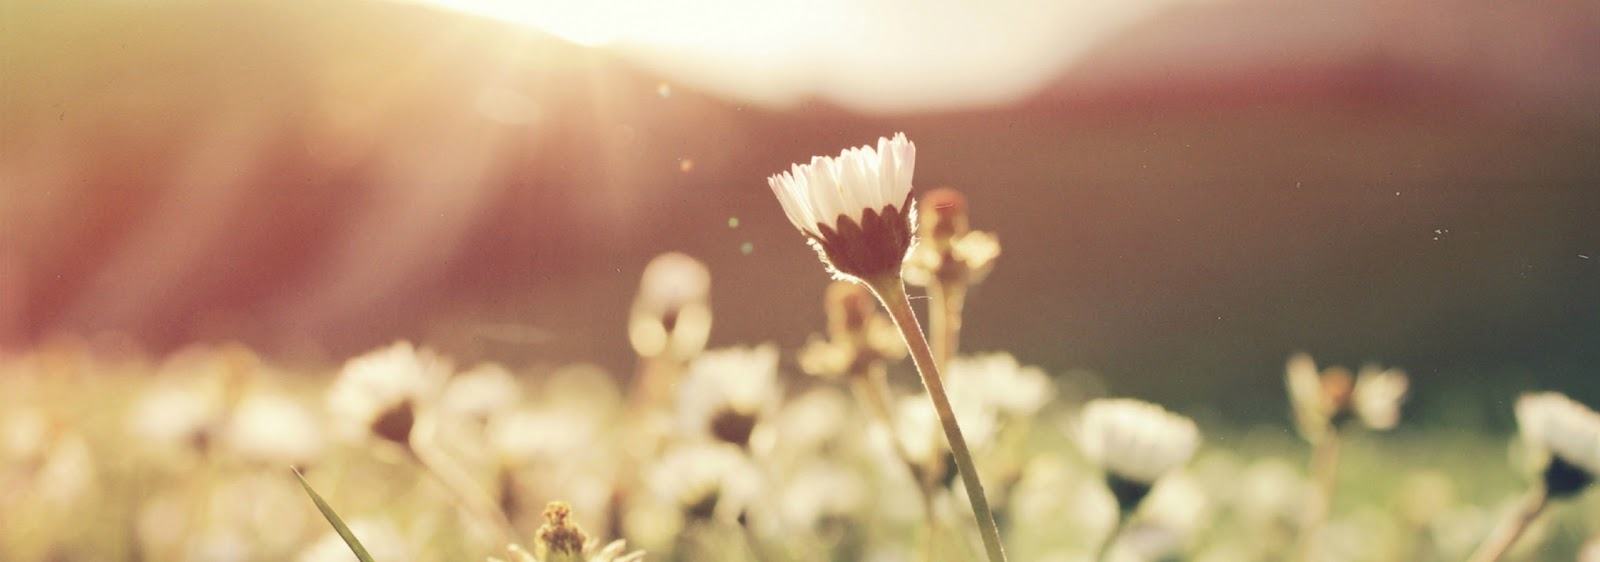 white daisy reaching up to the rising sun